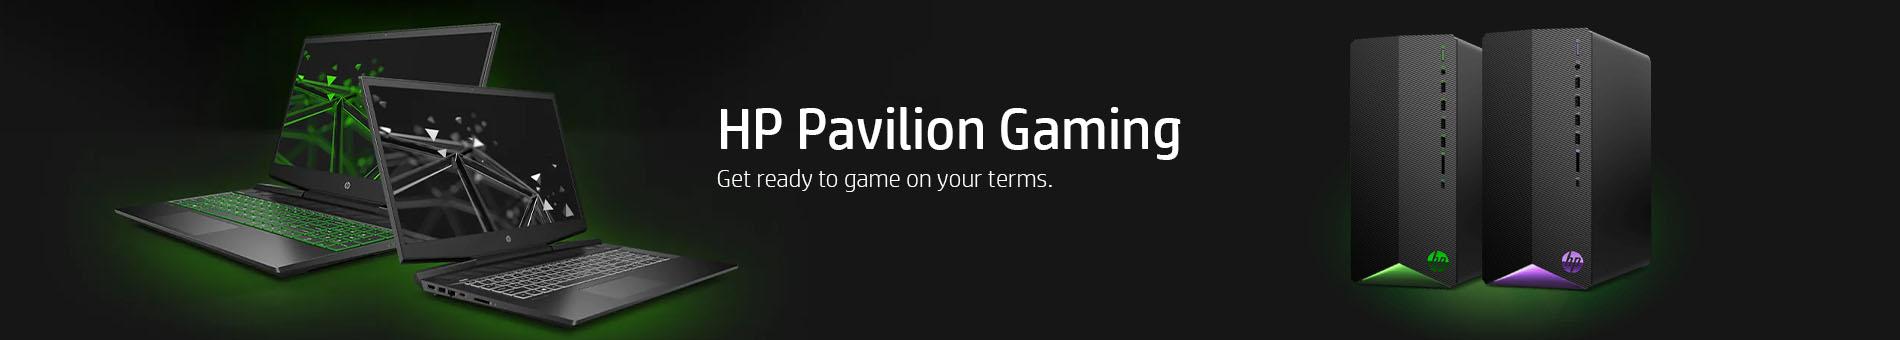 Pavilion Banner2